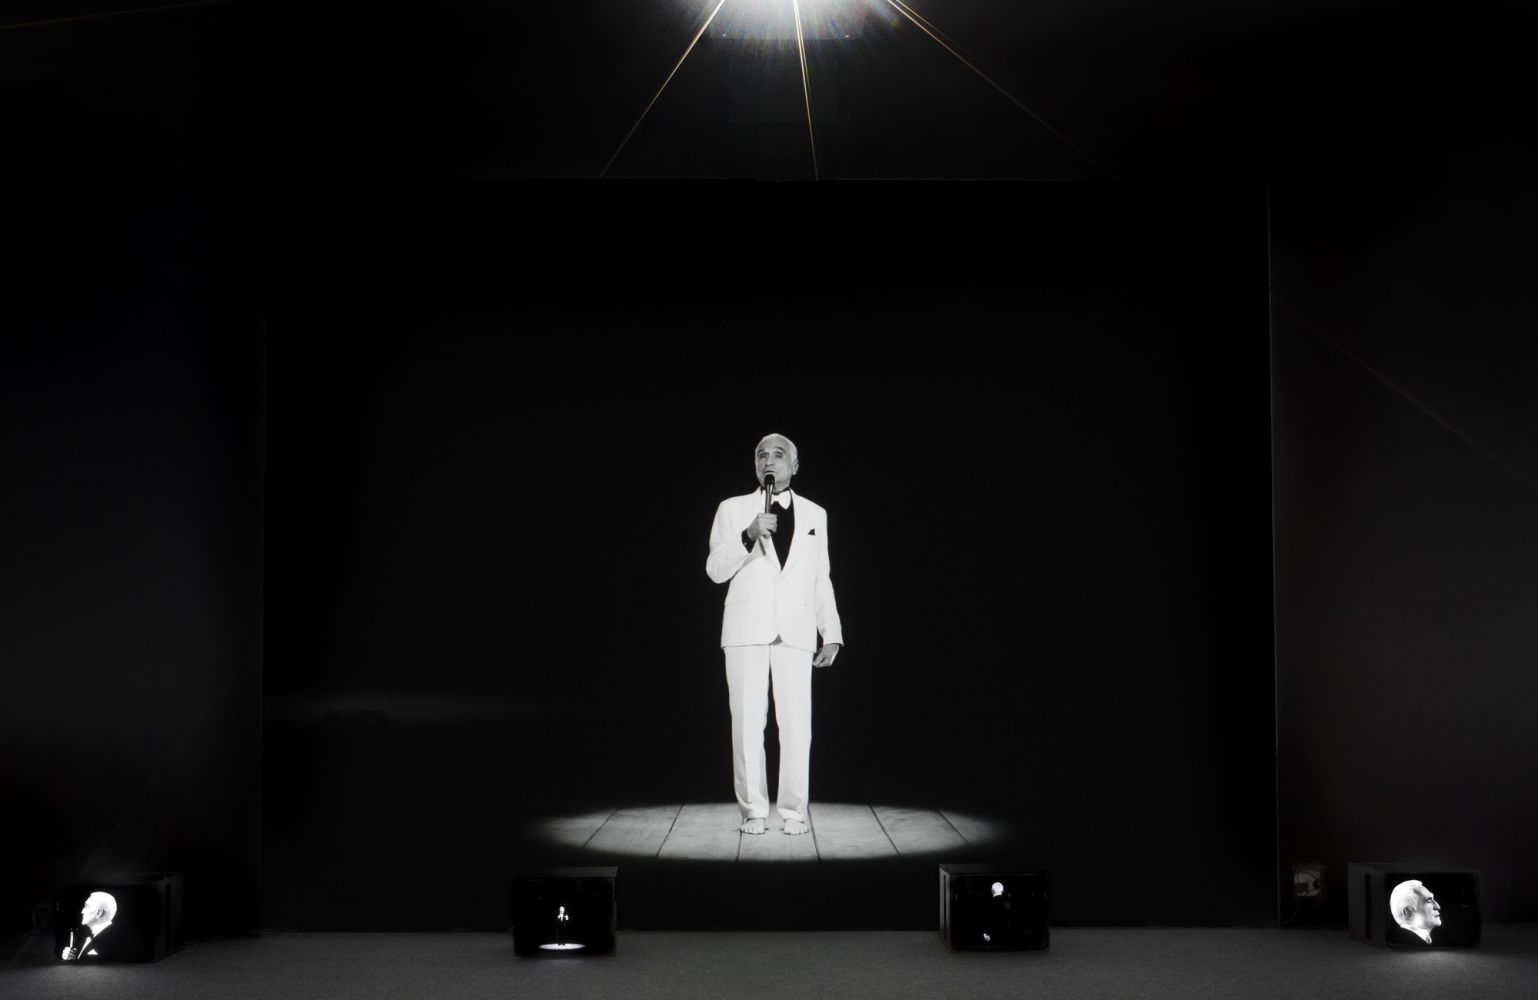 Ugo Rondinone's Thanx 4 Nothing for I ♥ John Giorno, Palais de Tokyo, 2015